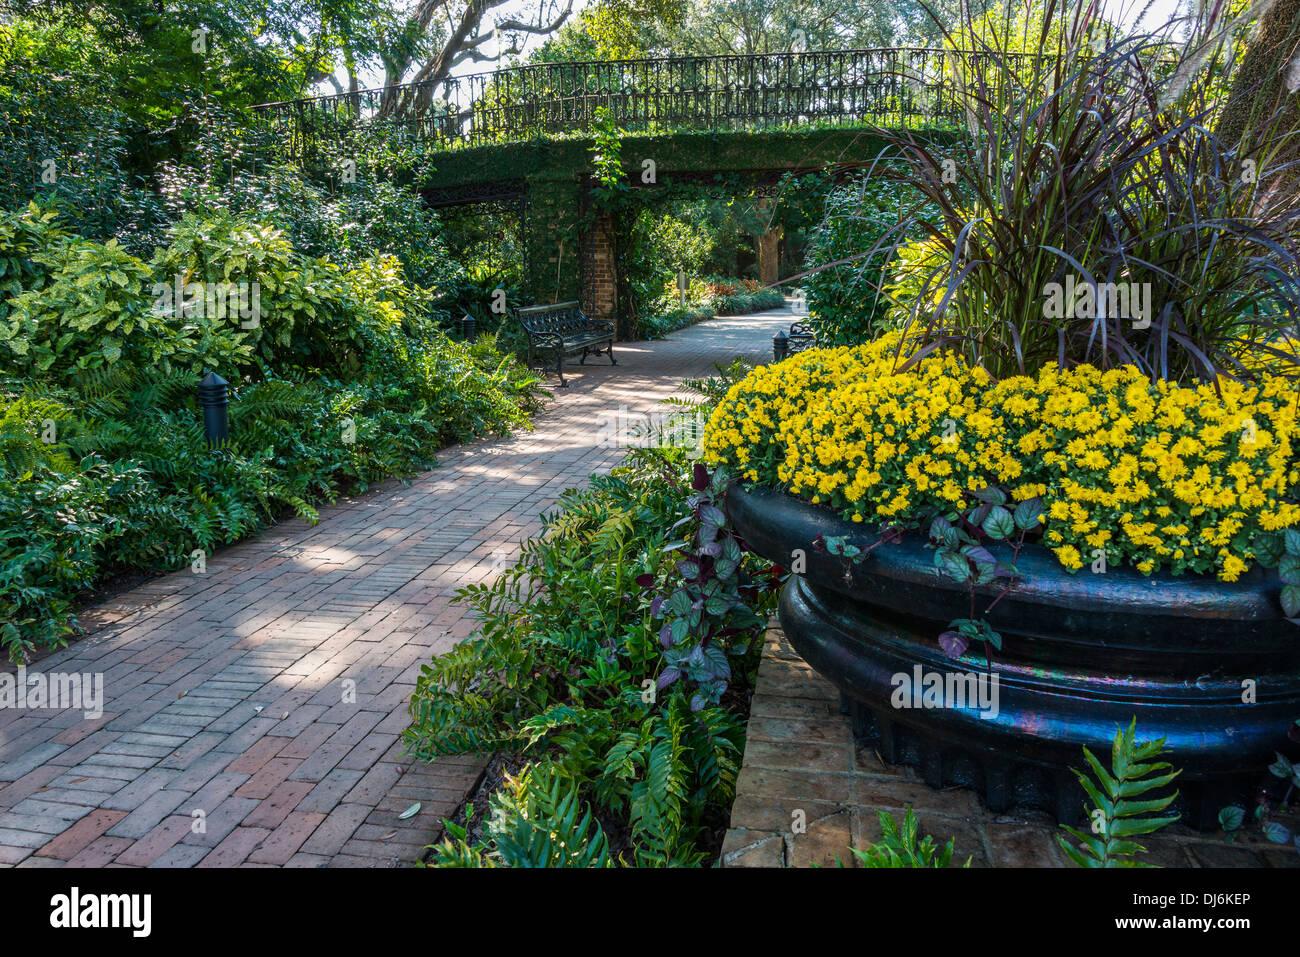 Inside Bellingrath Gardens, Theodore, Alabama. - Stock Image